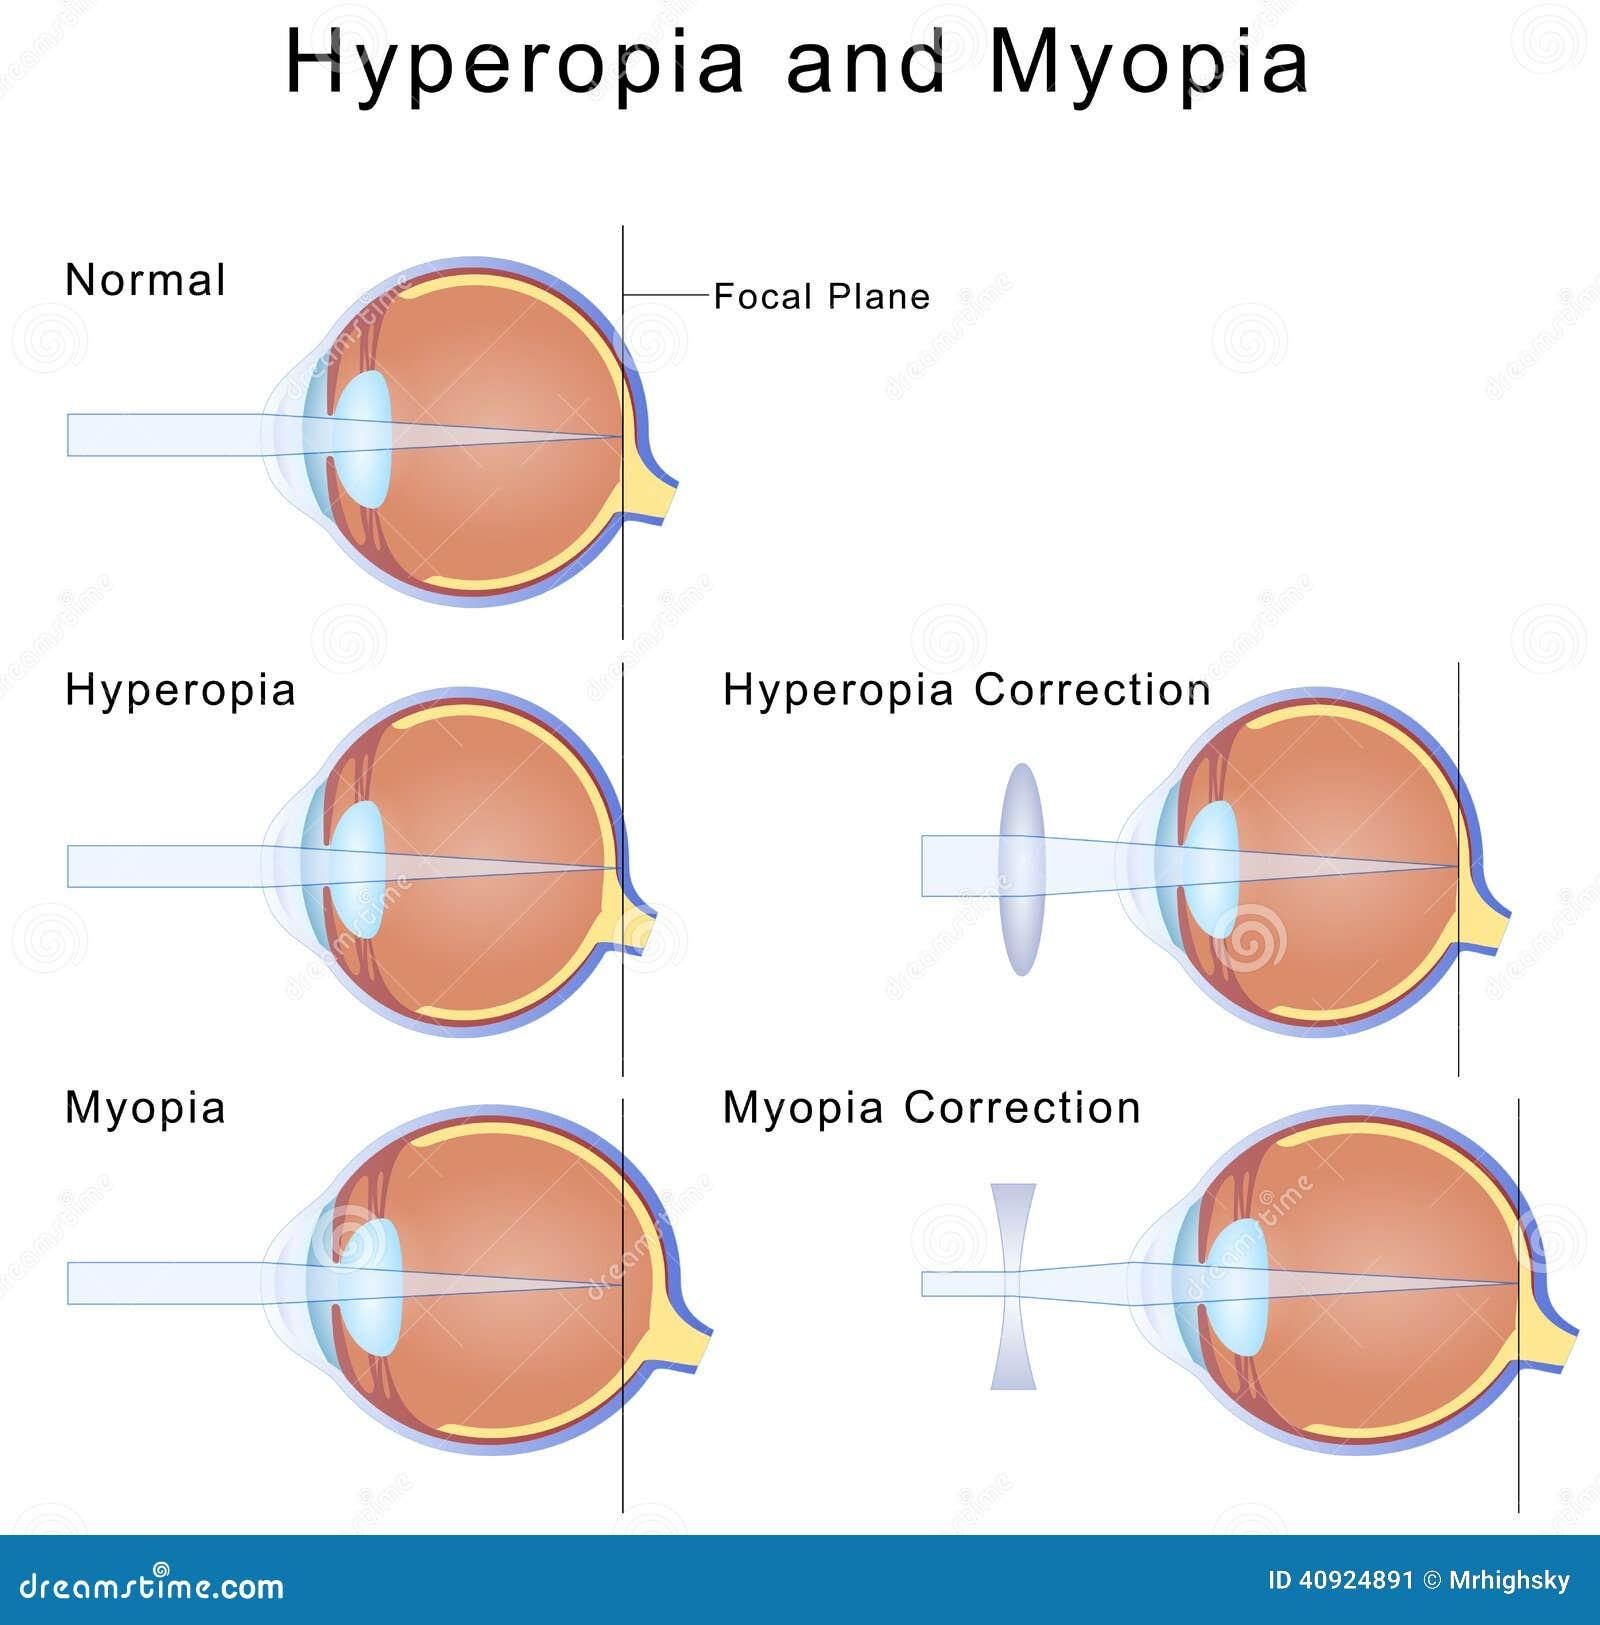 d192f1b452 Απεικόνιση του όρου μυωπίας και hyperopia των ματιών και της διόρθωσής τους